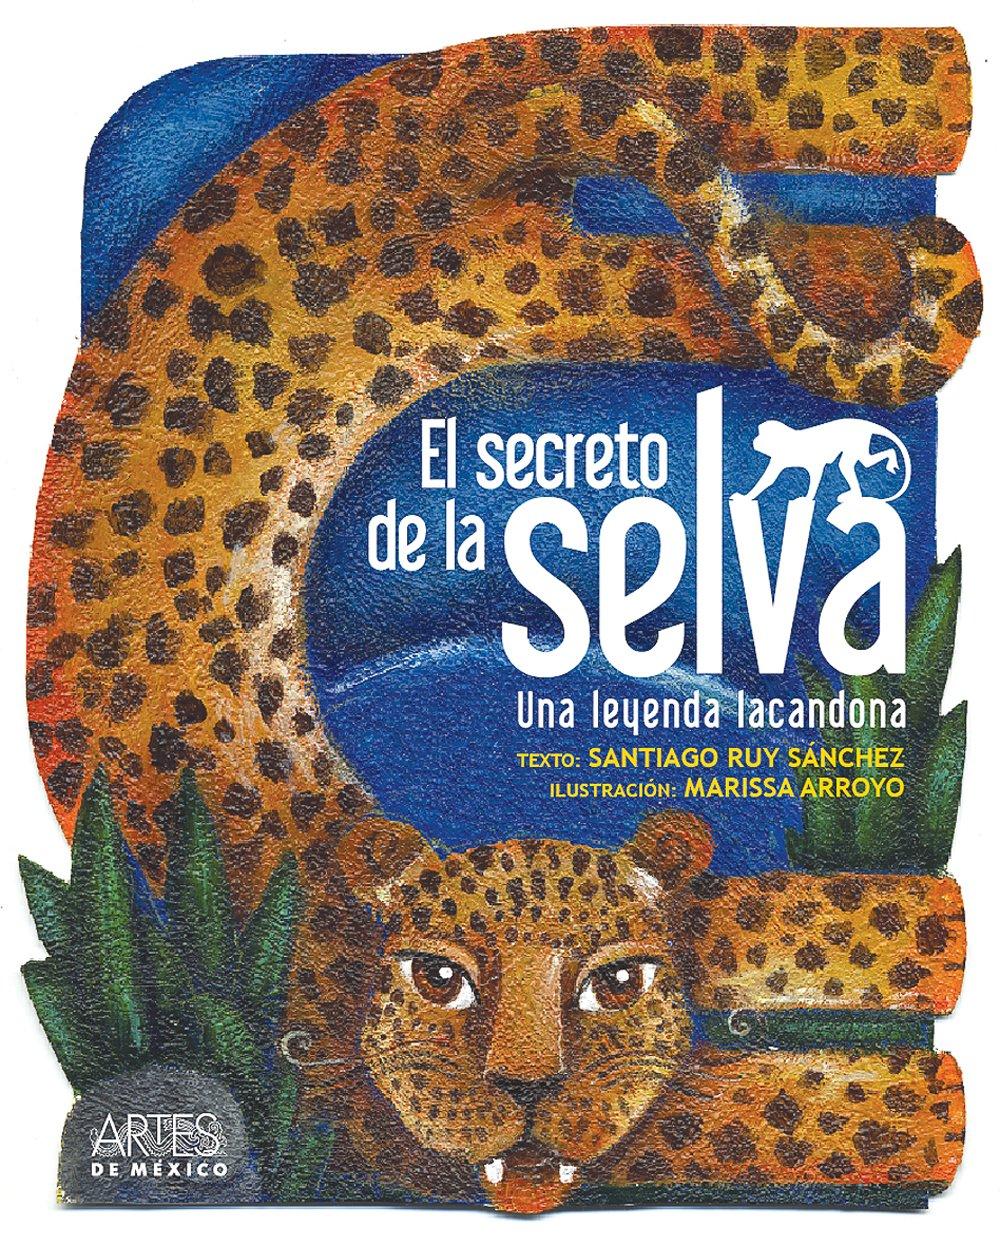 Download El secreto de la selva / The Secret Of The Forest: lUna Leyenda Lacandona / A Lacandona's Legend (Spanish Edition) ebook